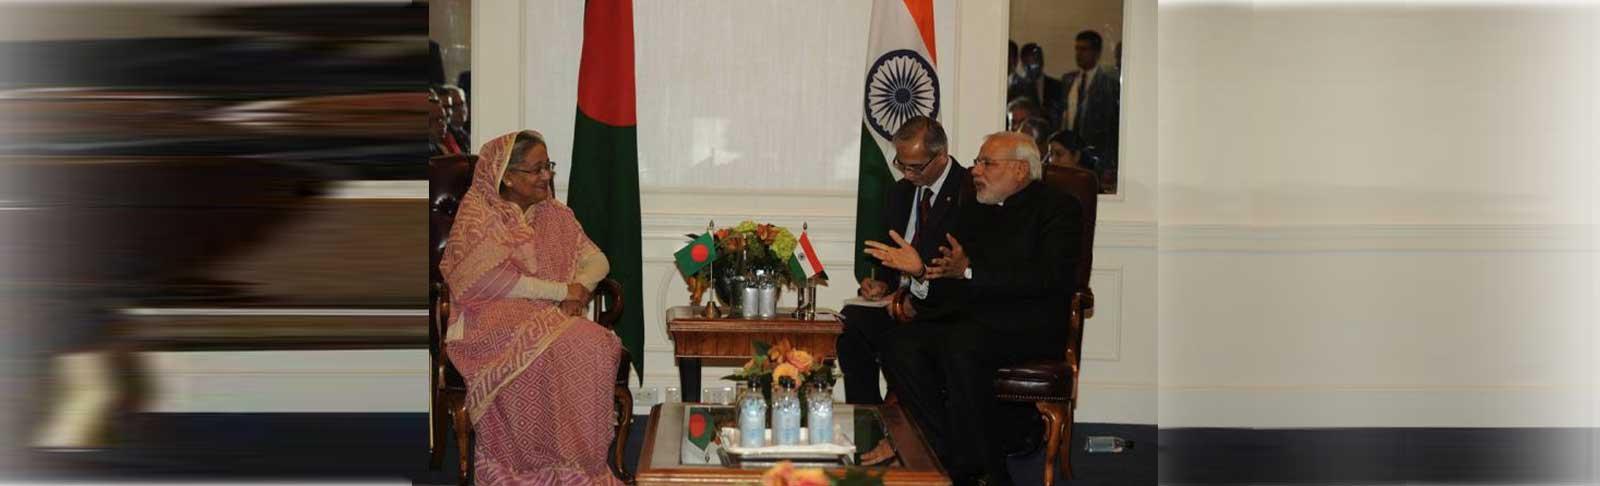 India and Bangladesh Ties: Moving Beyond the Teesta River Agreement